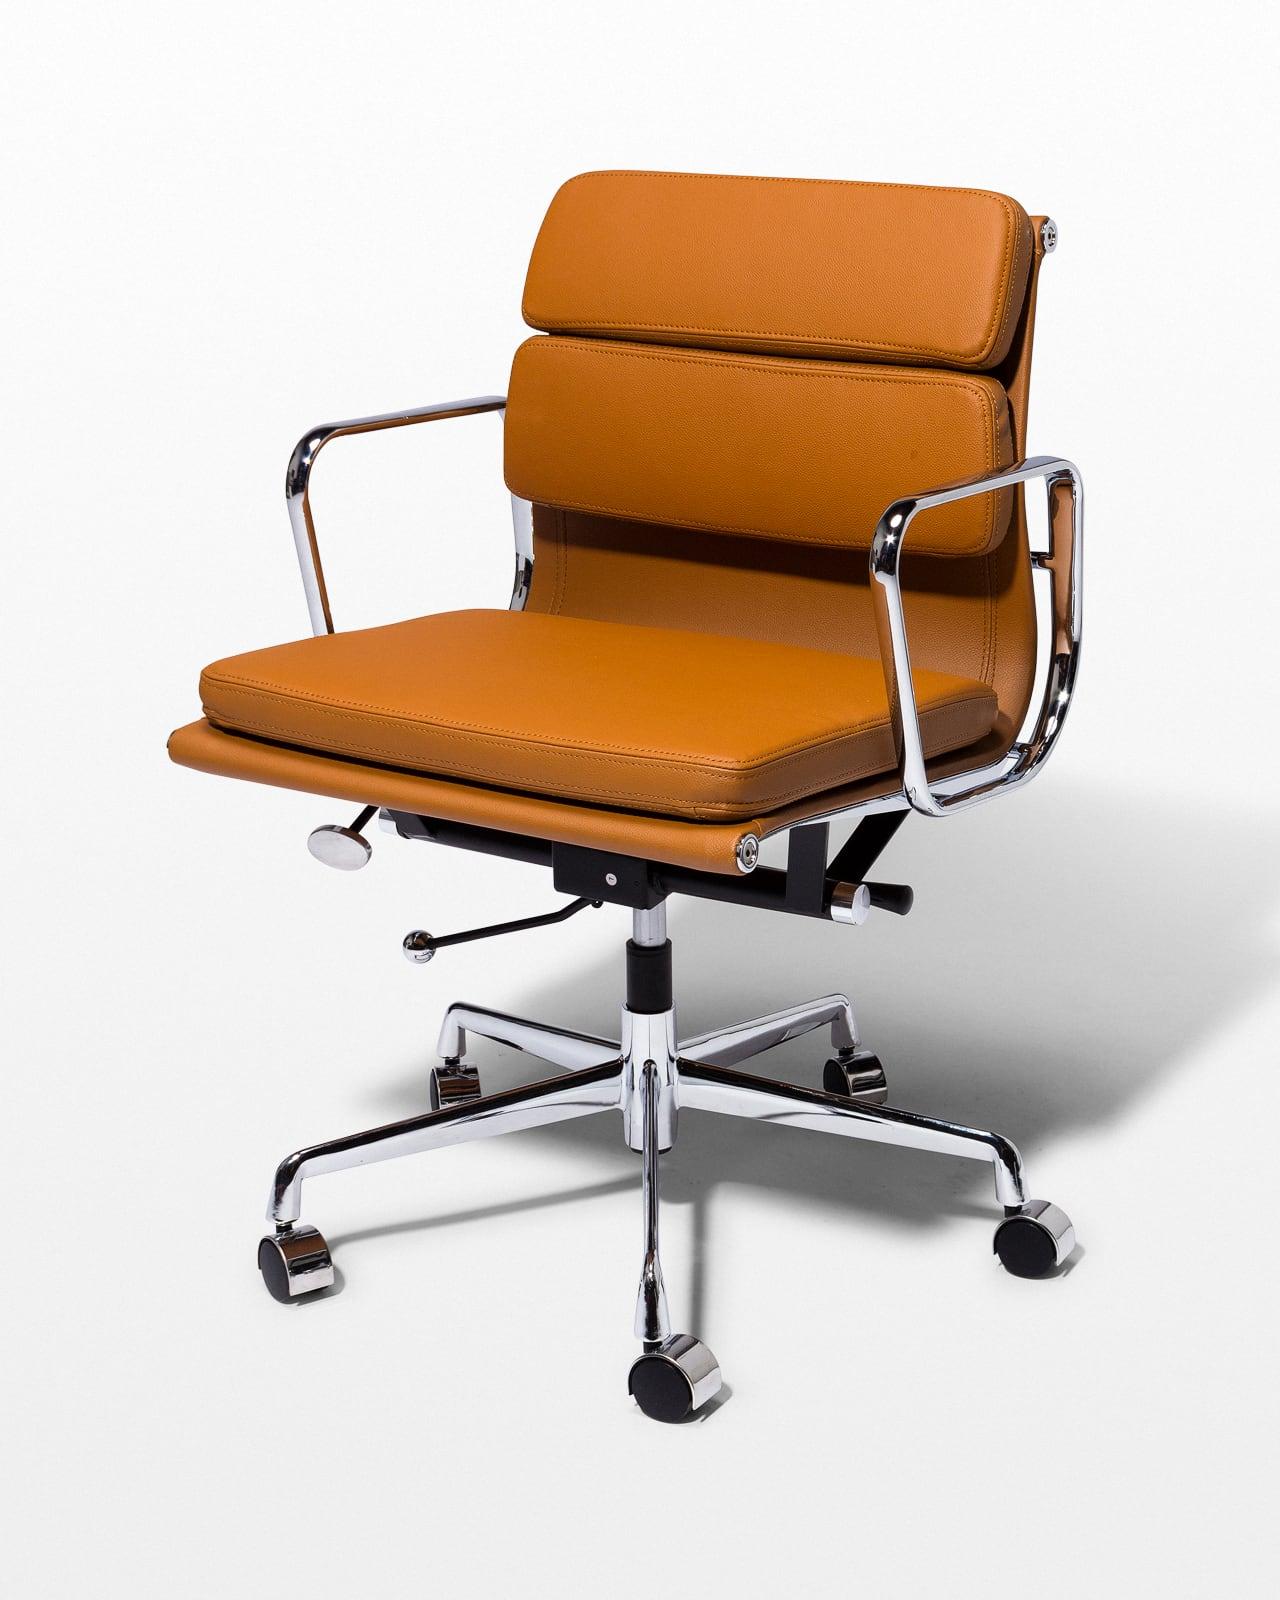 Ch610 Halpert Brown Leather Rolling Desk Chair Prop Rental